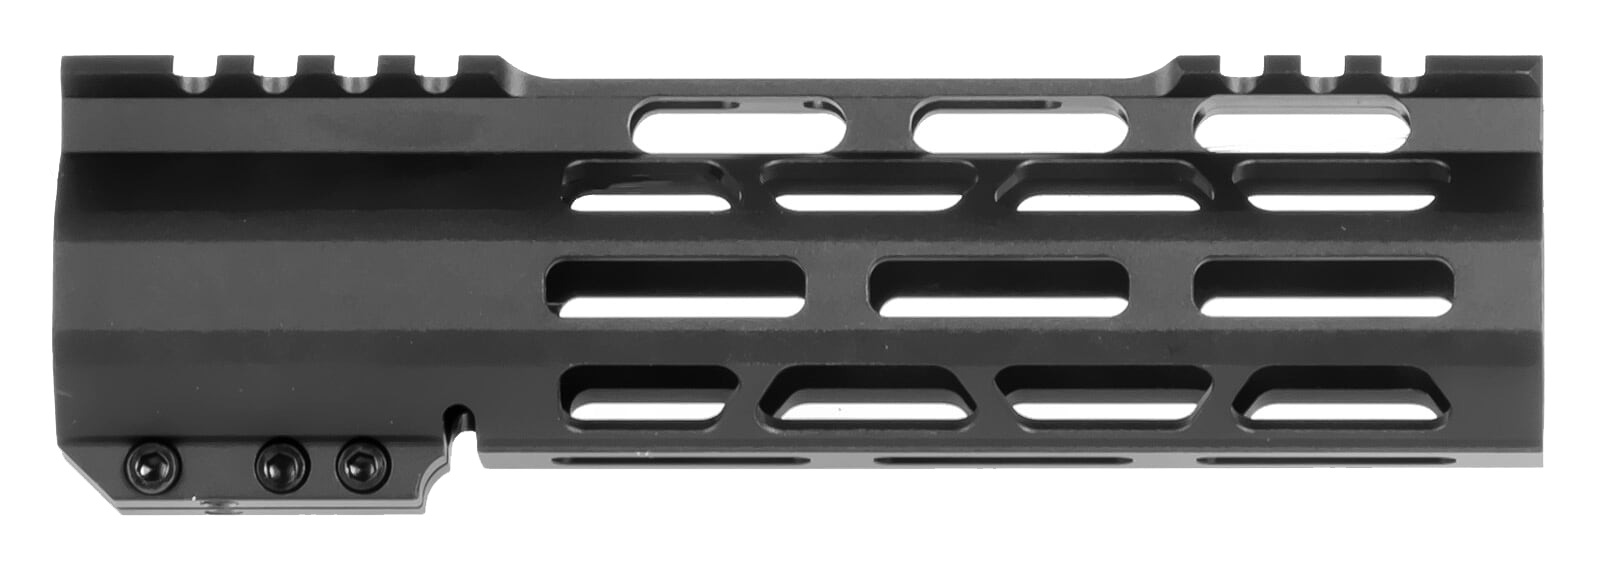 ar-15-hand-guard-7-slim-mlok-with-detach-rails